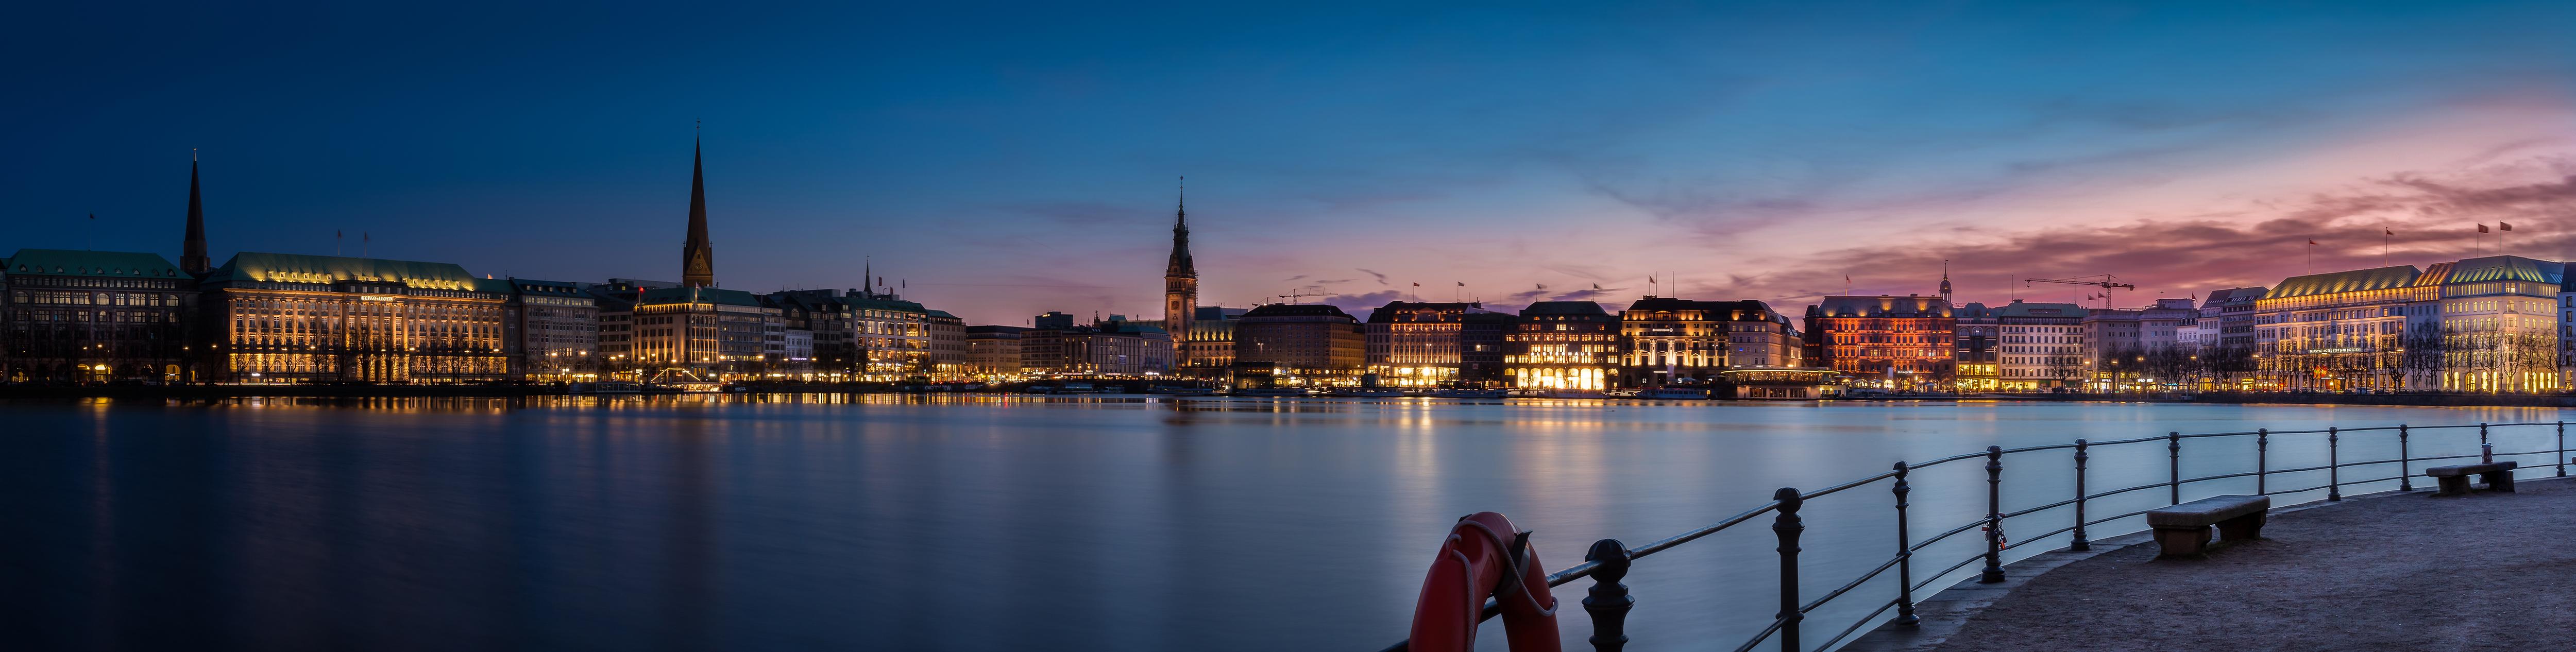 Hamburg, Binnenalster bei Nacht